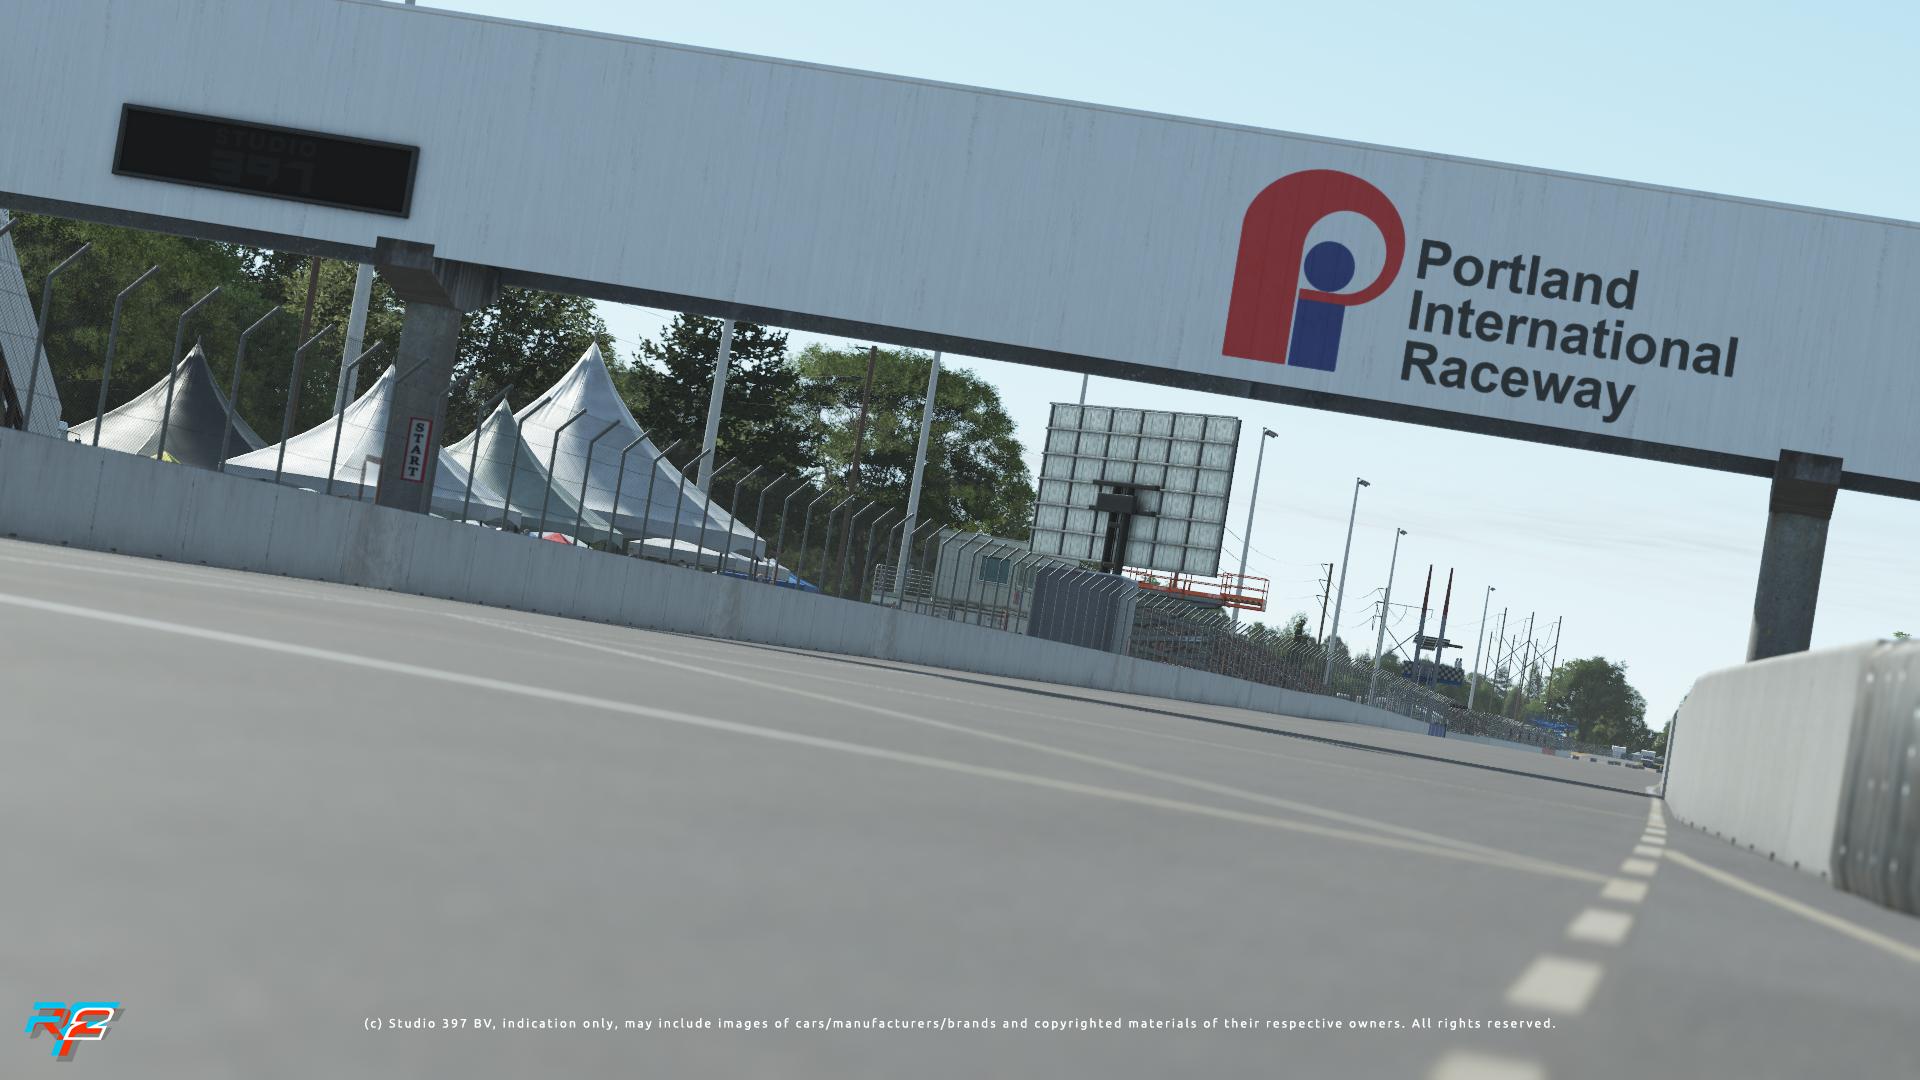 portland_2020_screen_01 Portland International Raceway for rFactor 2 – Released